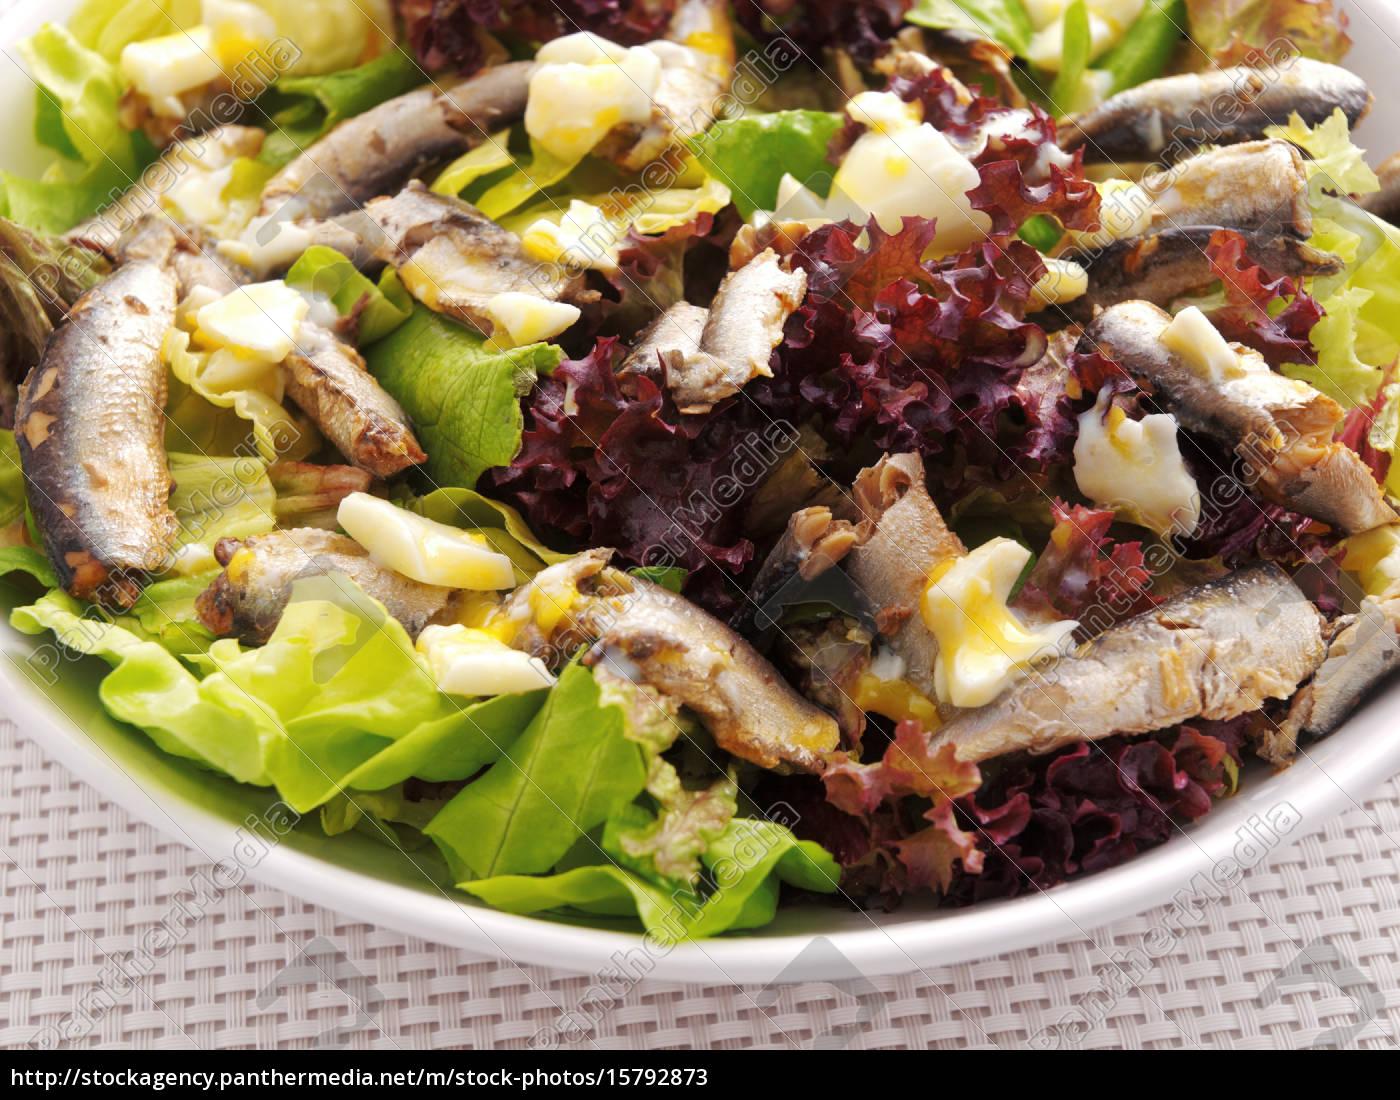 chicken, salad, chicken, salad, chicken, salad, chicken, salad, chicken, salad, chicken - 15792873